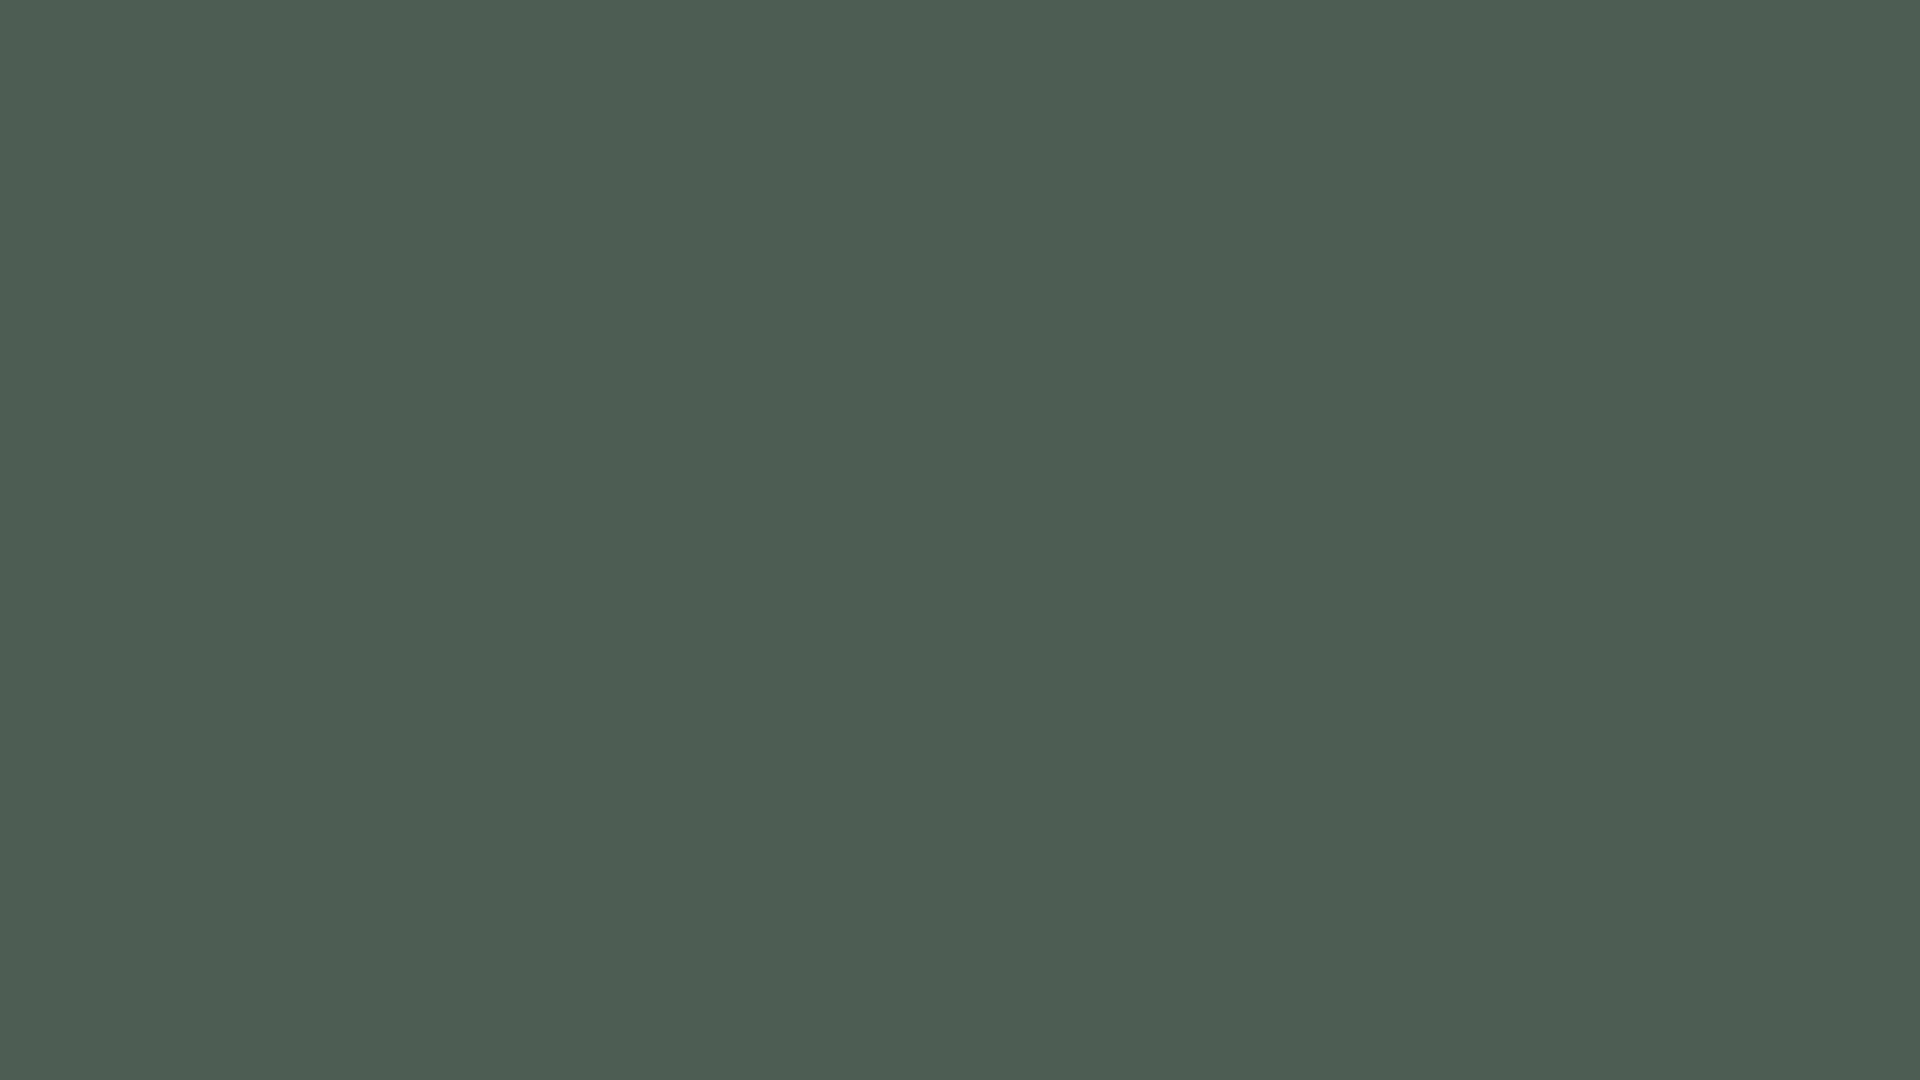 1920x1080 Feldgrau Solid Color Background